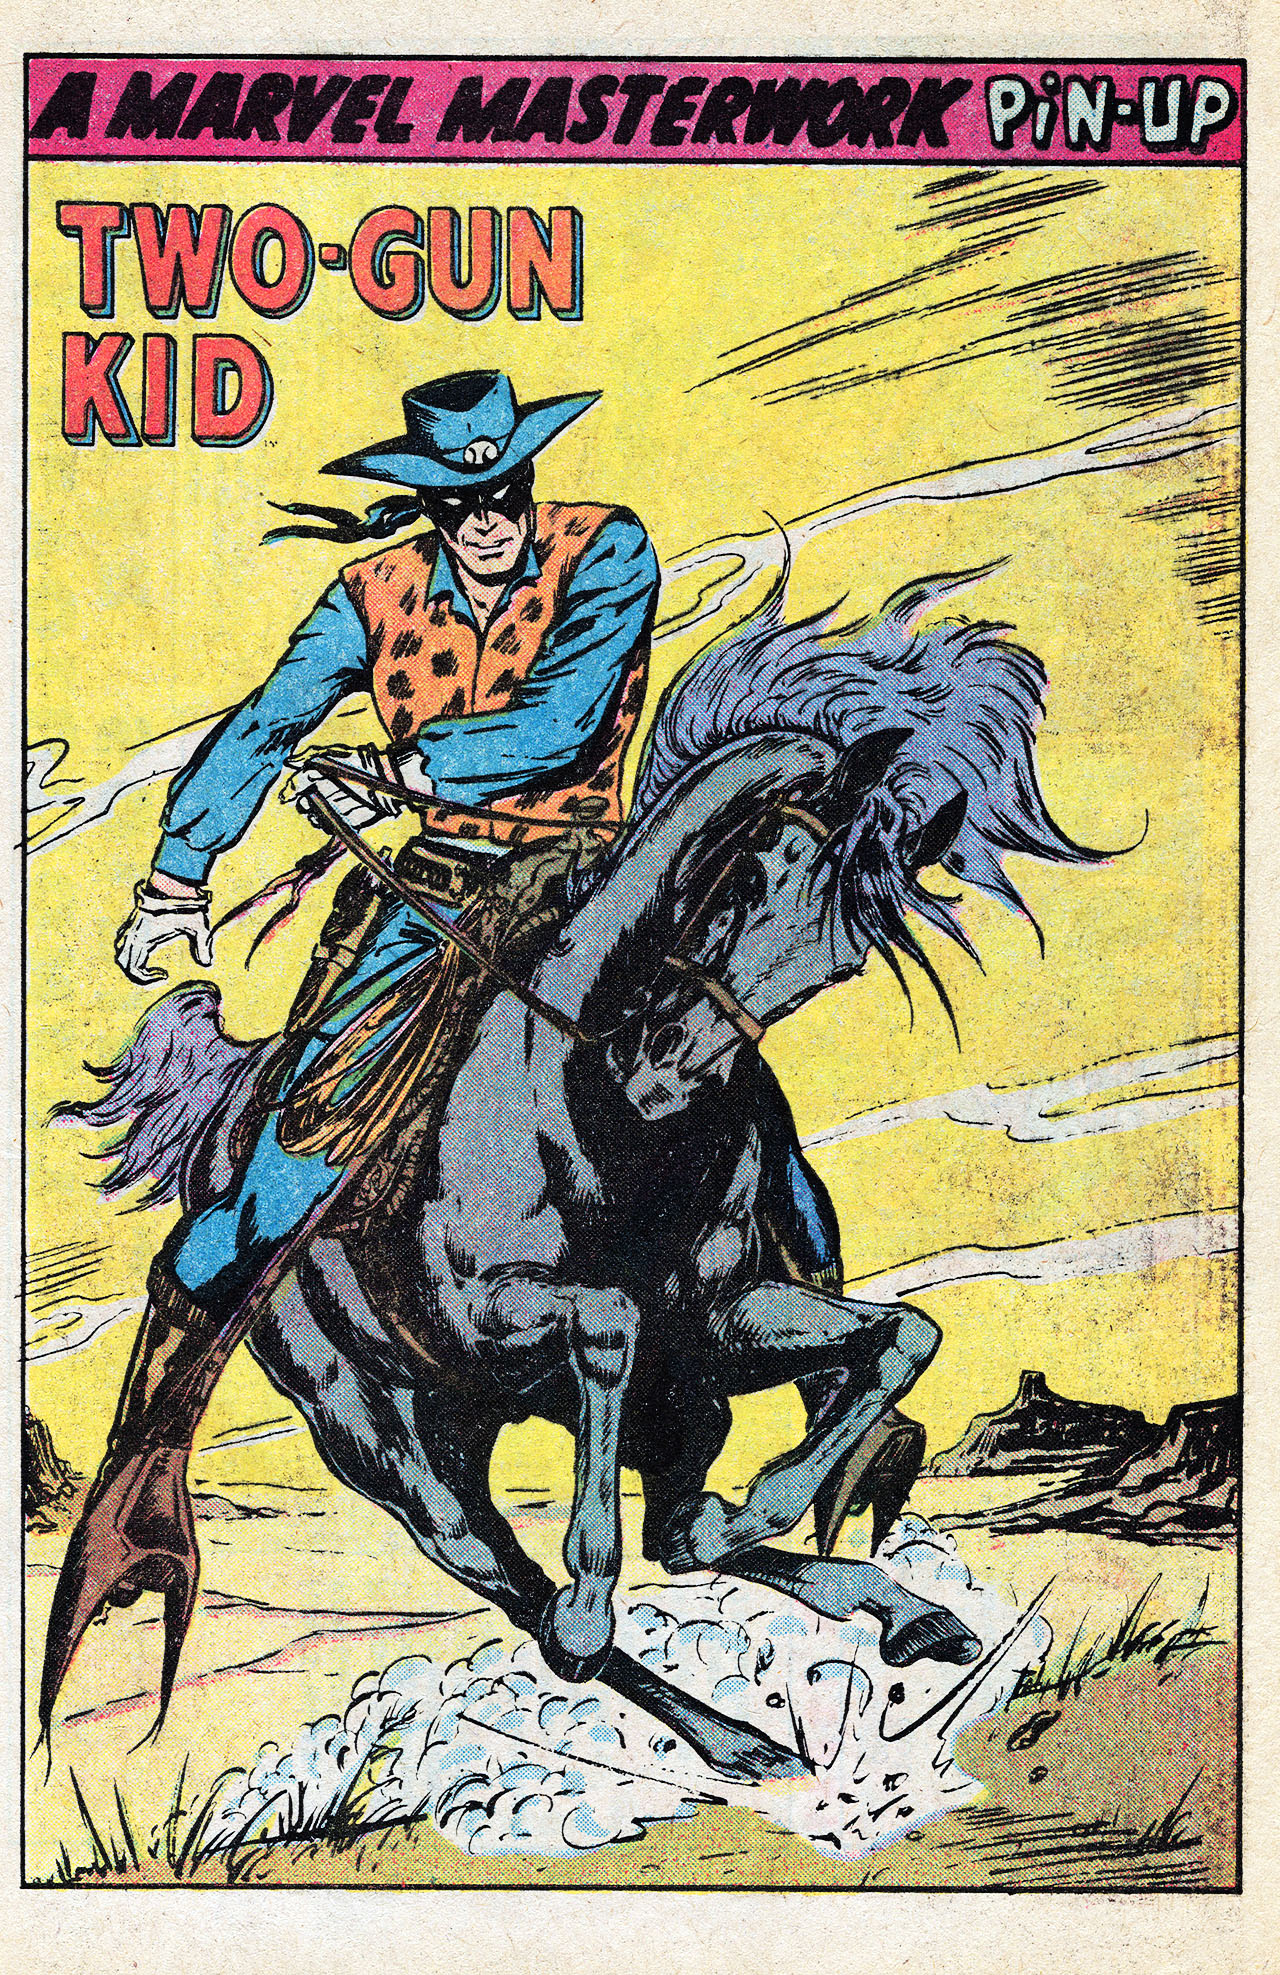 Read online Two-Gun Kid comic -  Issue #136 - 33